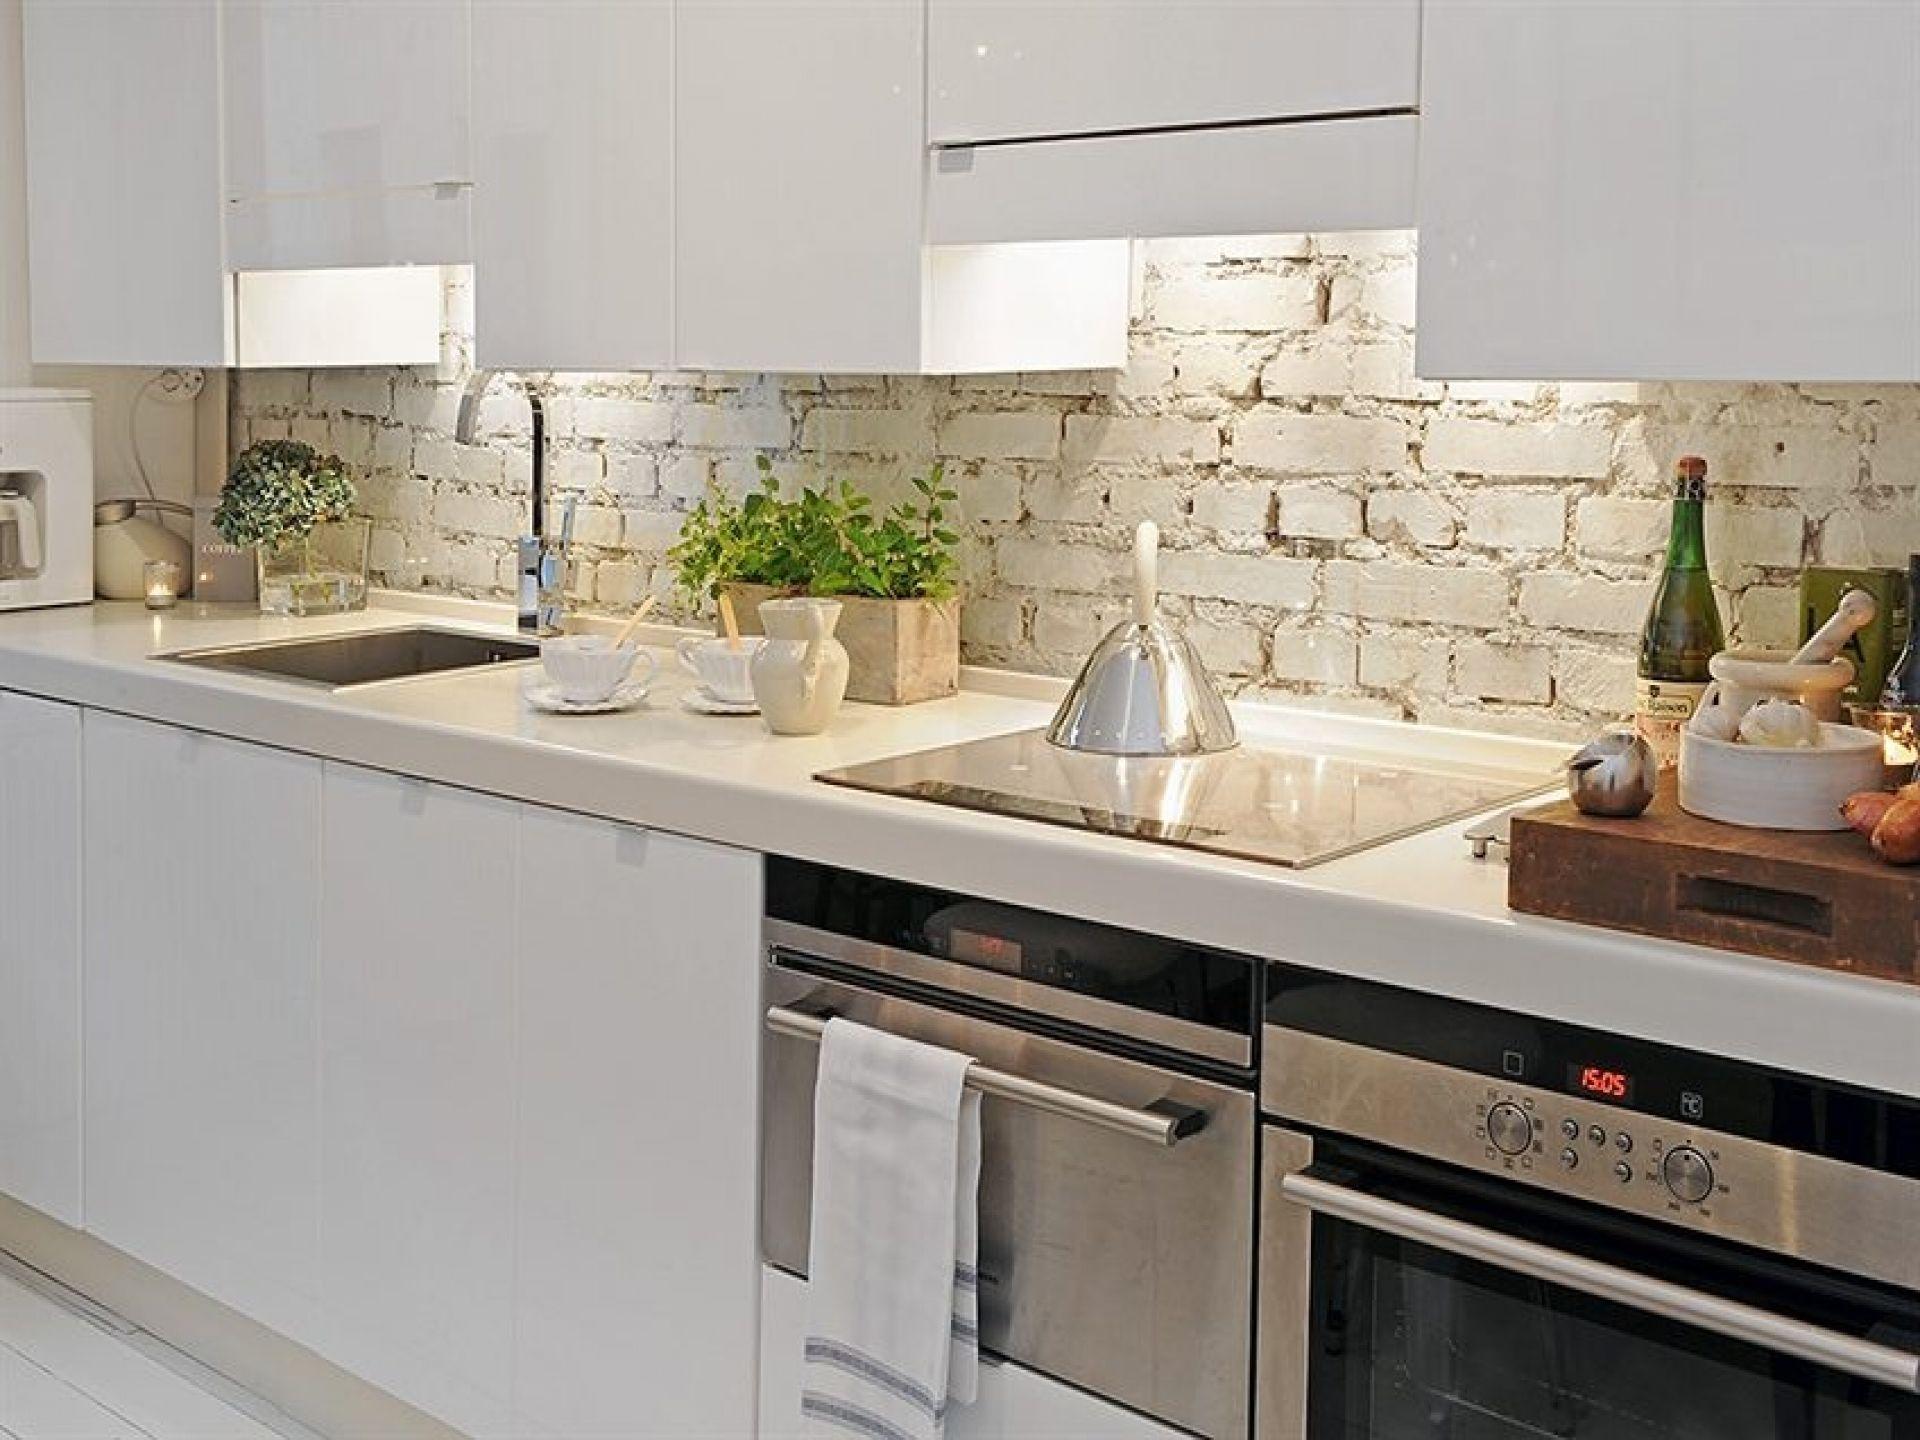 Sweet Hard Wood Modern Kitchen Cabinetry Set In White Feat Rustic Brick Backsplash An Modern Kitchen Backsplash Brick Backsplash Kitchen White Brick Backsplash